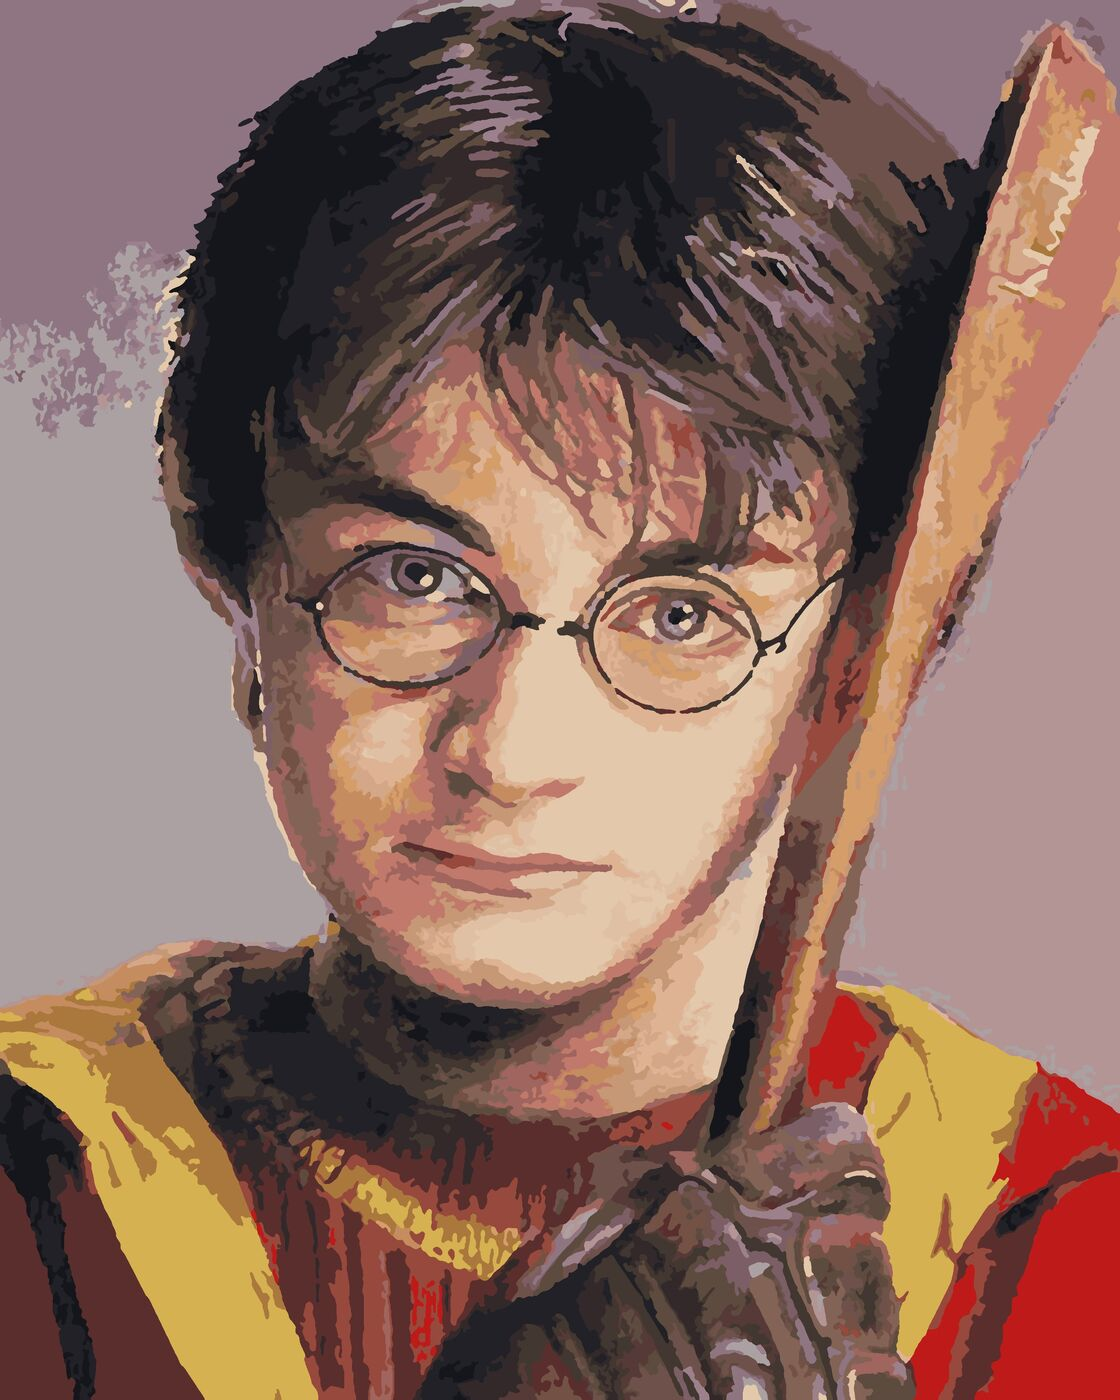 Картина по номерам Гарри Поттер с битой, 40 х 50 см ...